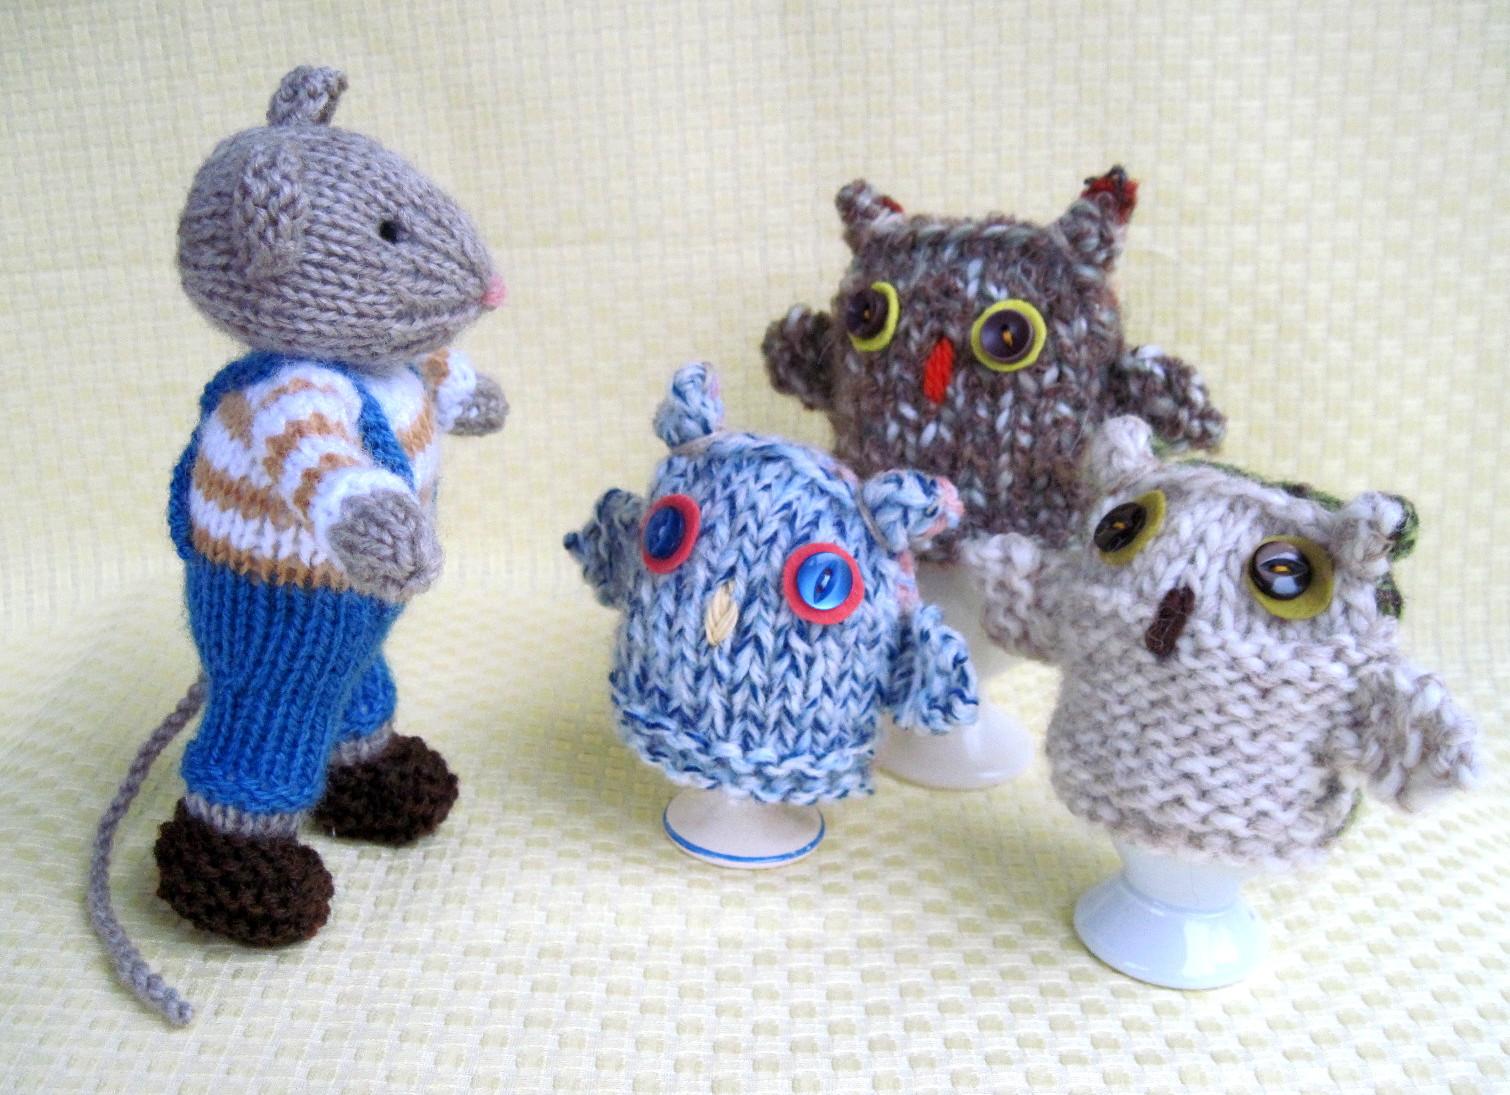 562fba2da504 Flutterby Patch  FREE PATTERN - Owl egg cosies